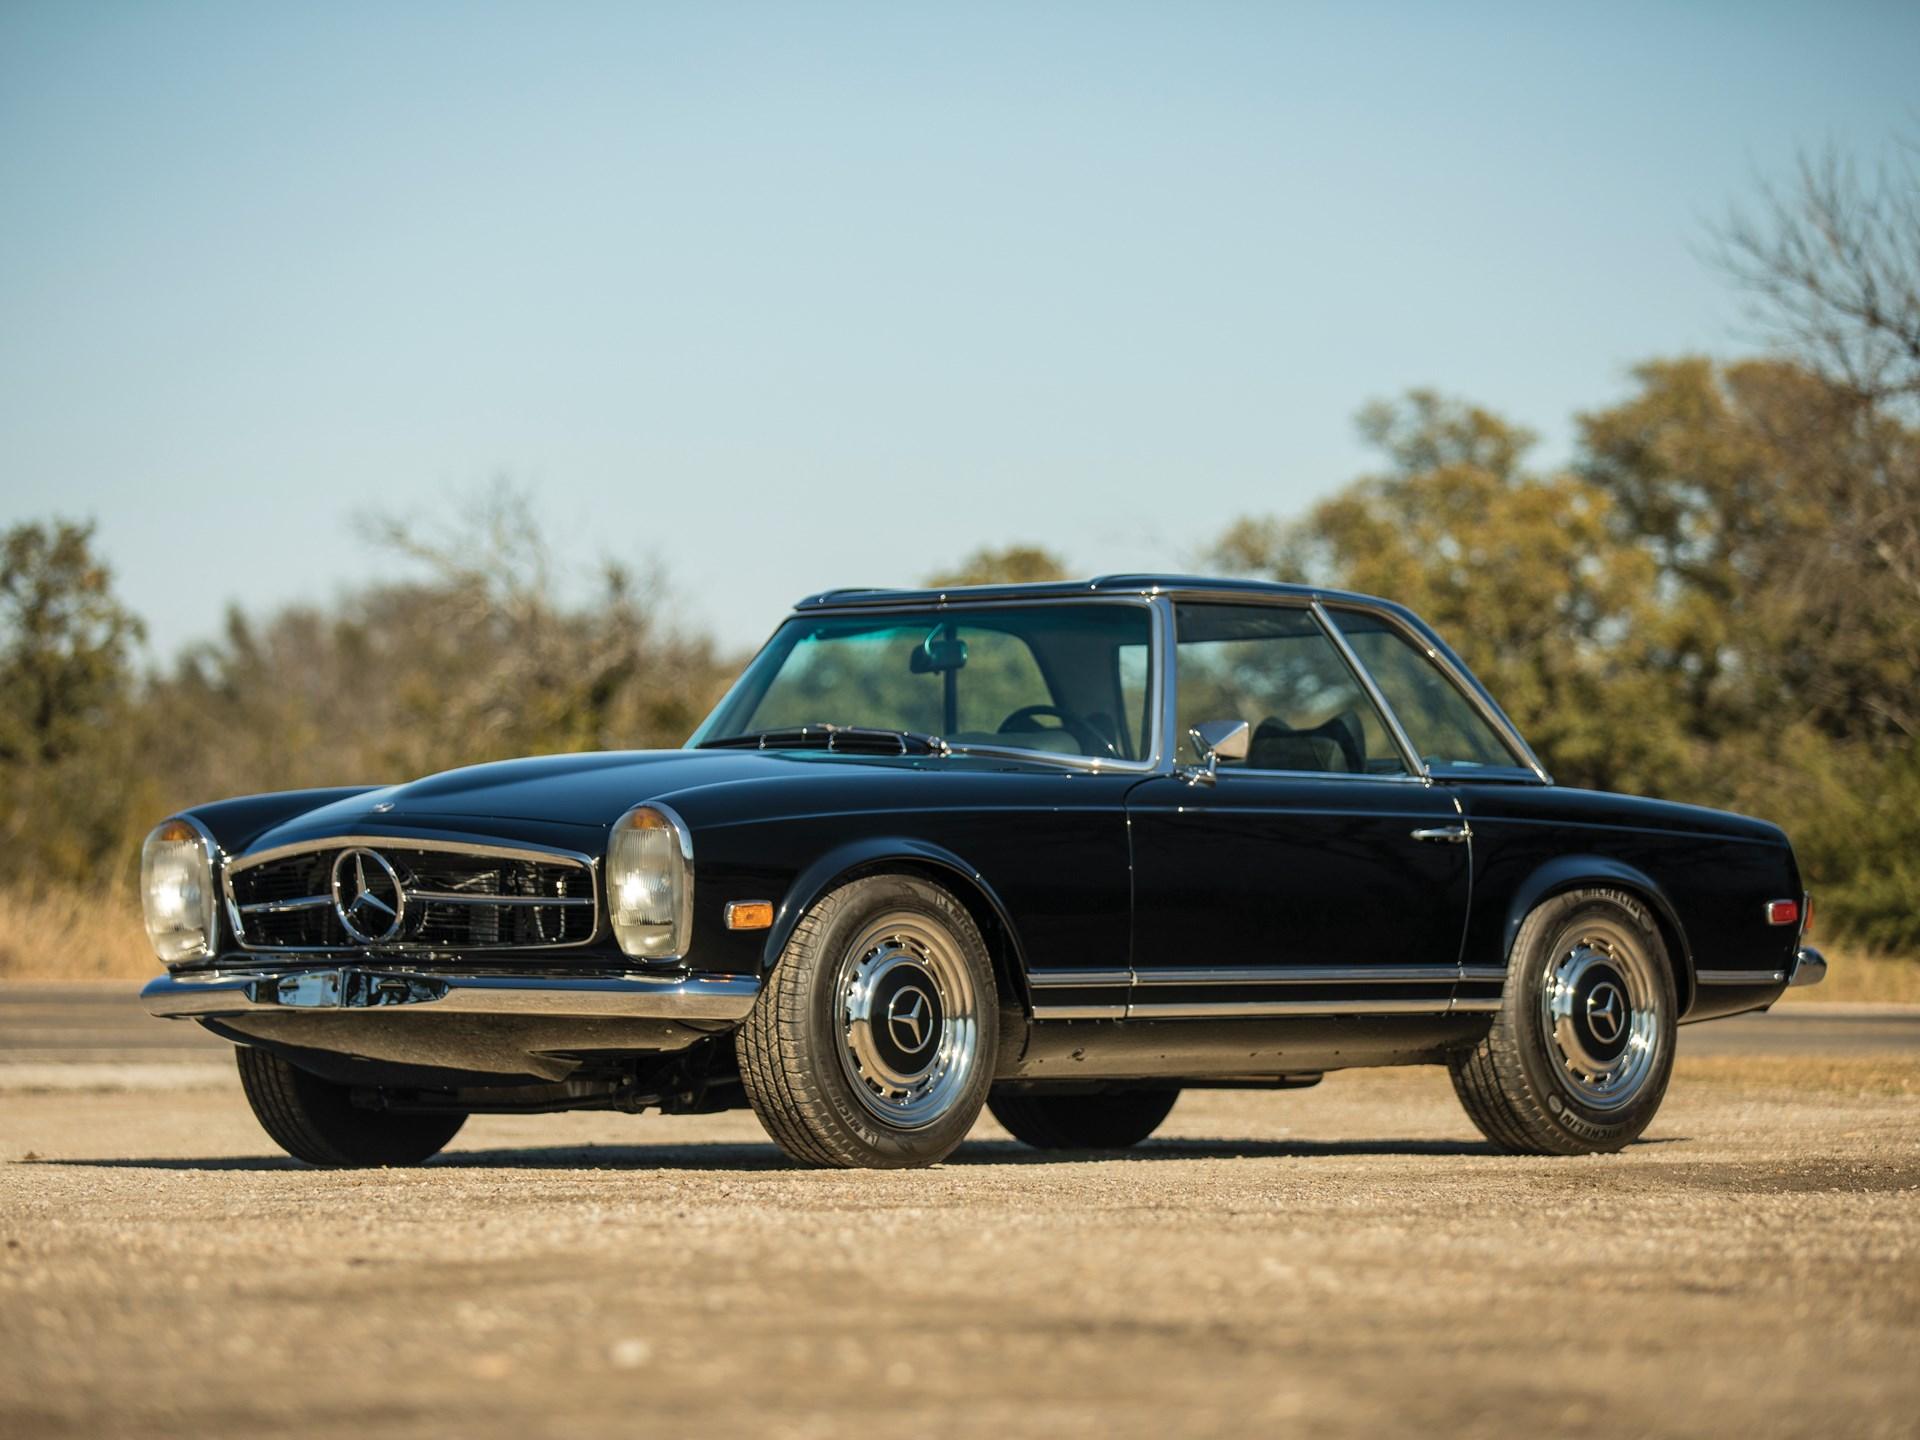 RM Sotheby's - 1970 Mercedes-Benz 280 SL 'Pagoda' Custom   Arizona 2019